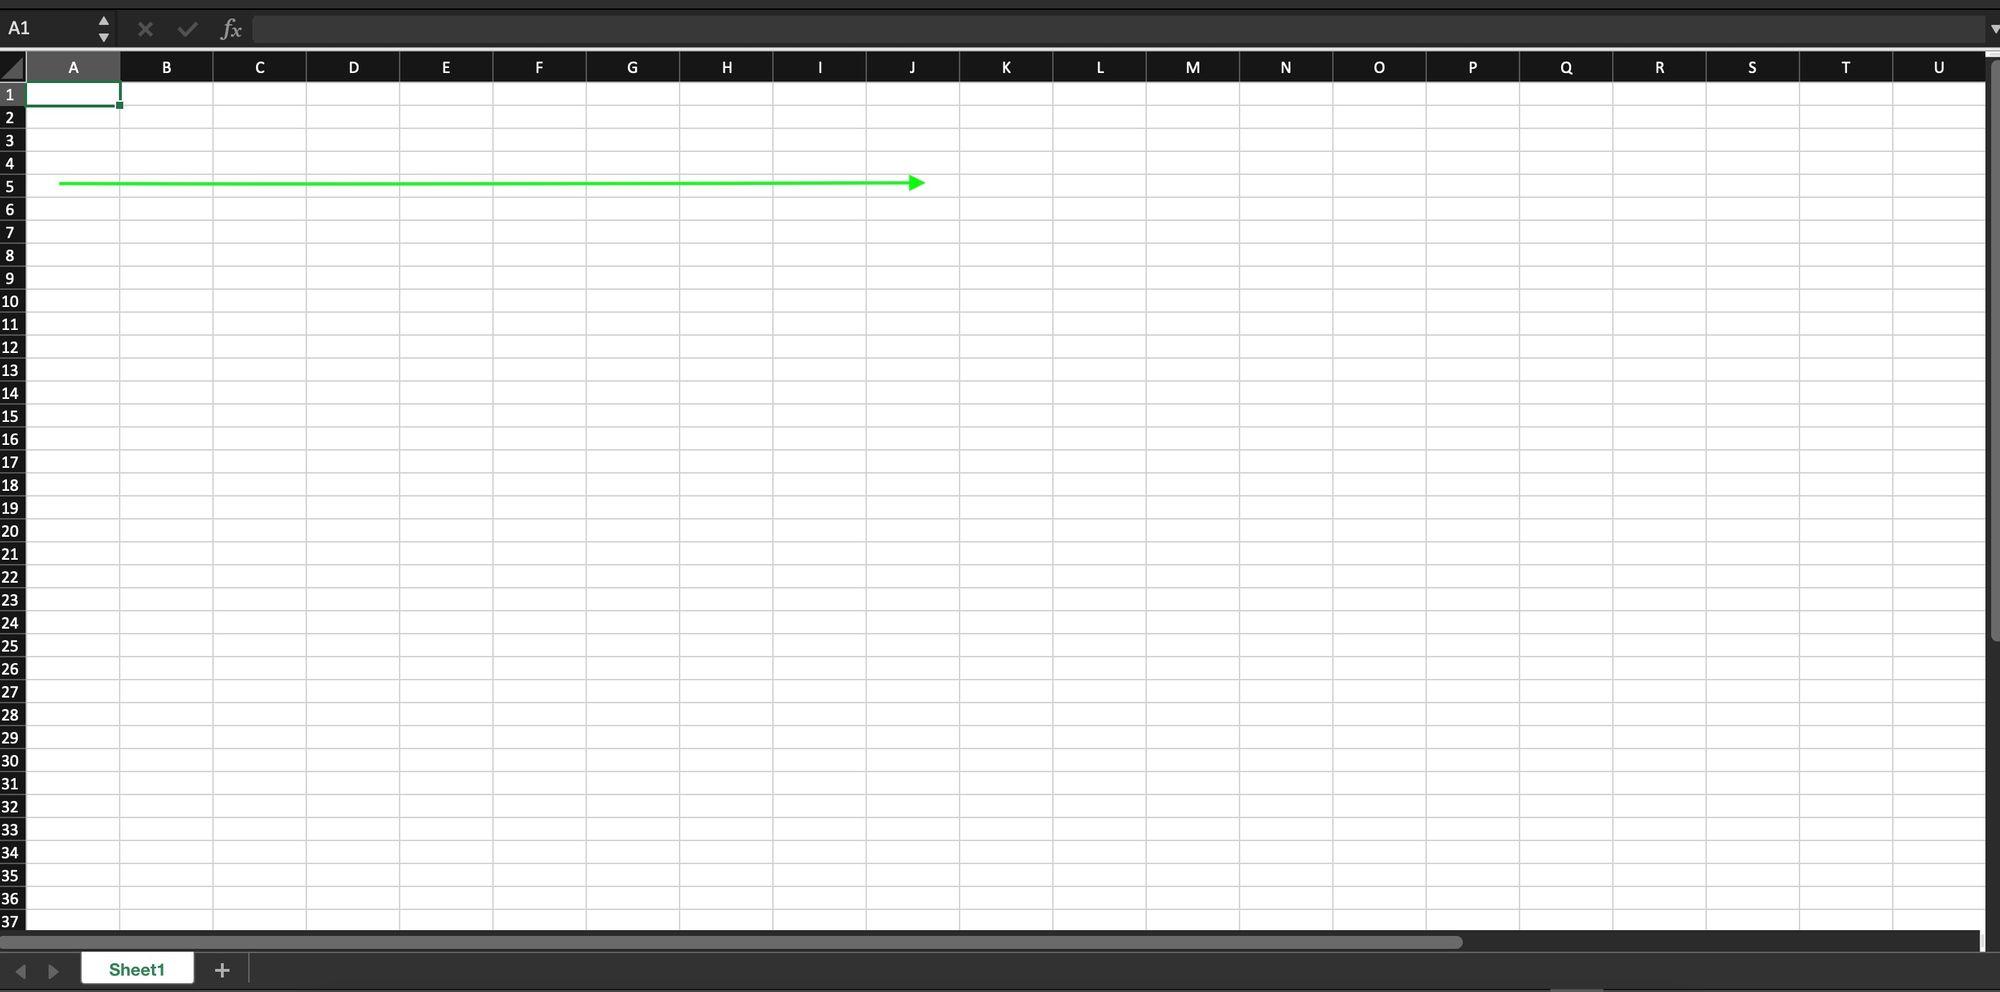 Screenshot-2021-08-06-at-5.28.11-PM